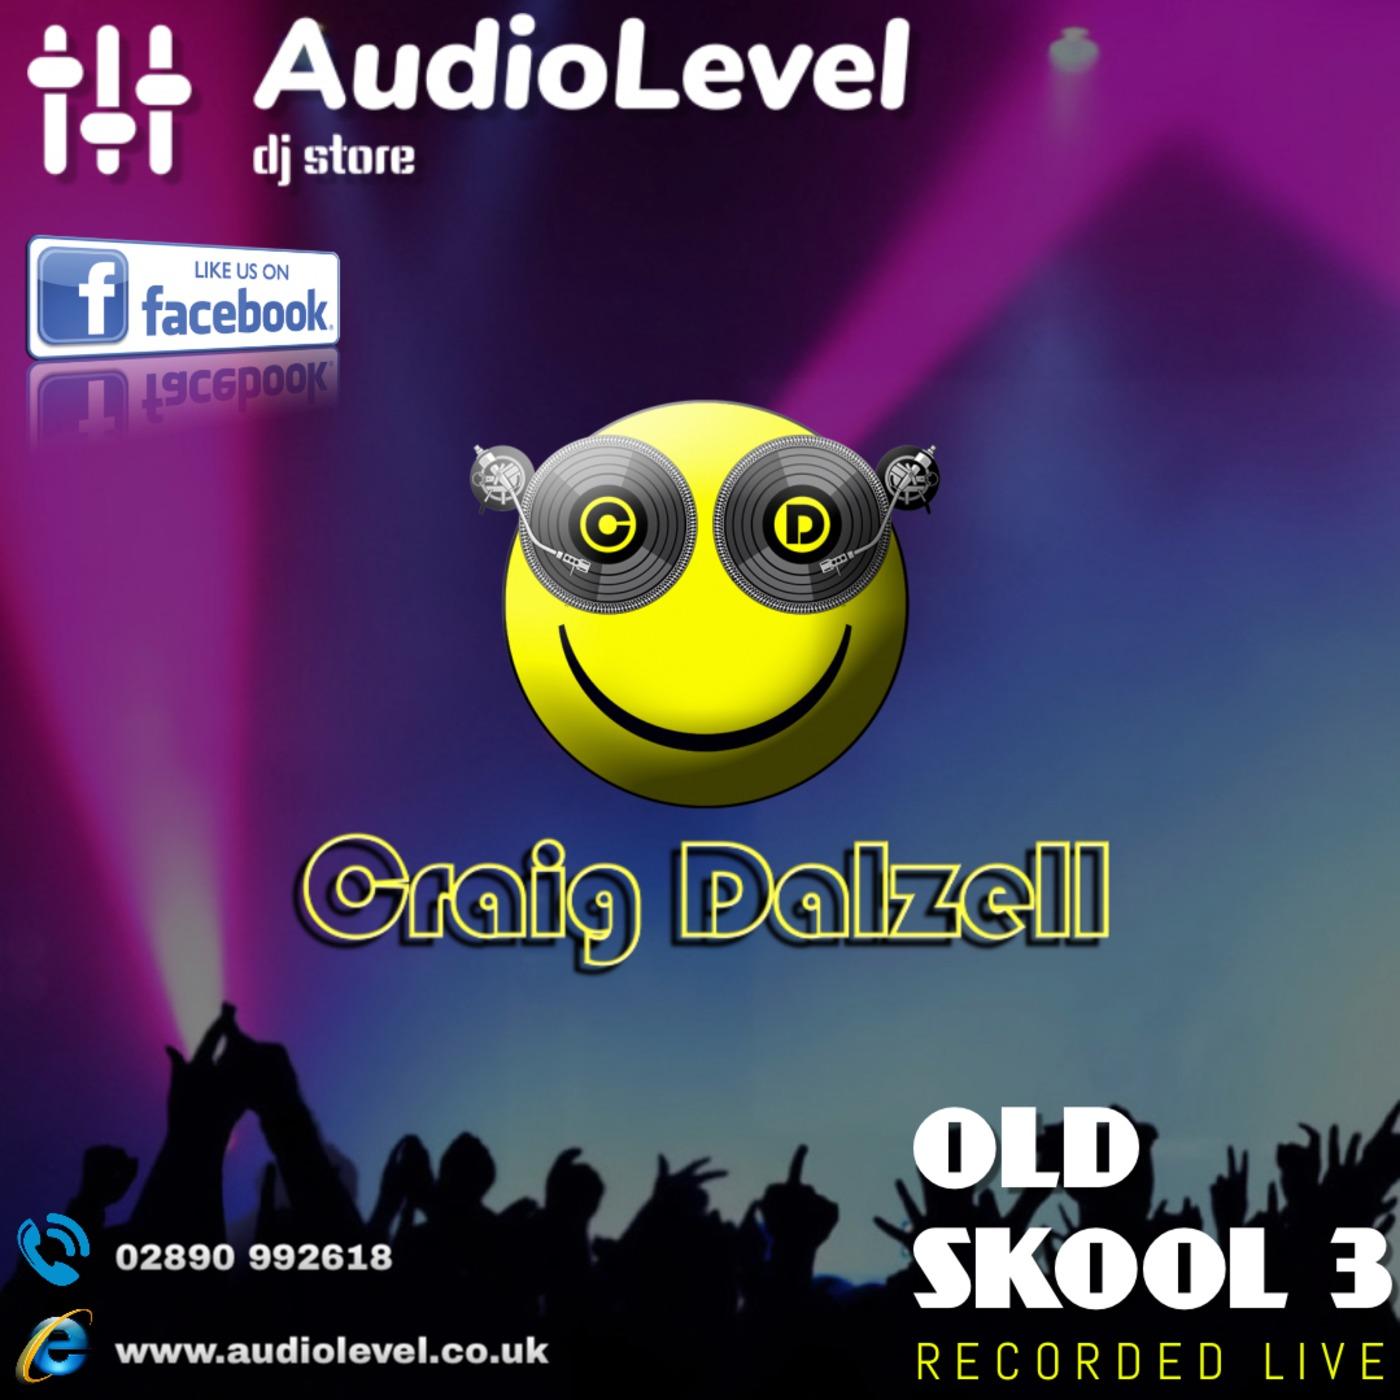 Old Skool 3 | Craig Dalzell Live @ AudioLevel (03/08/2019